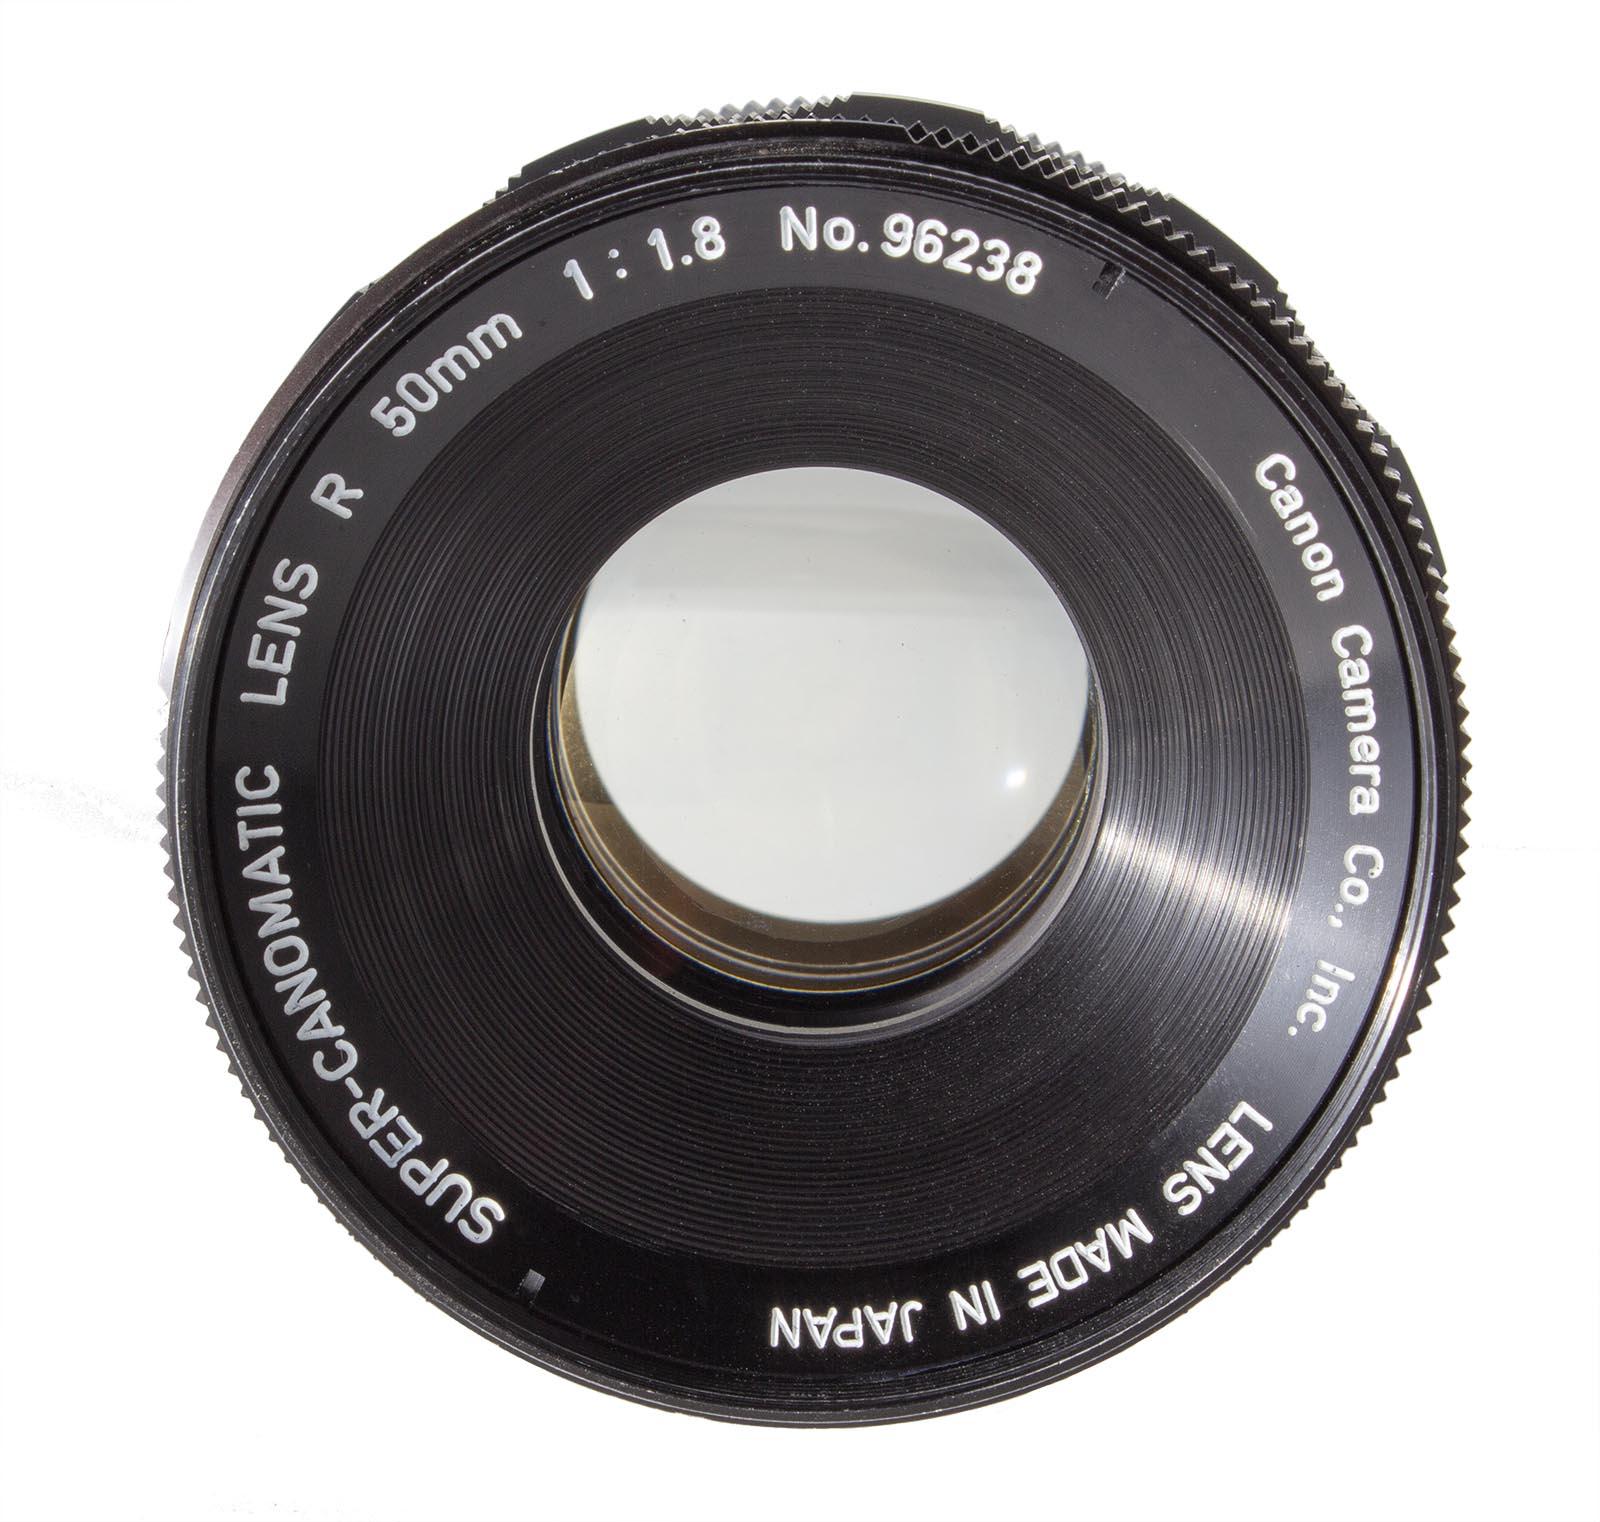 Canon R 50mm f/1.8 Lens